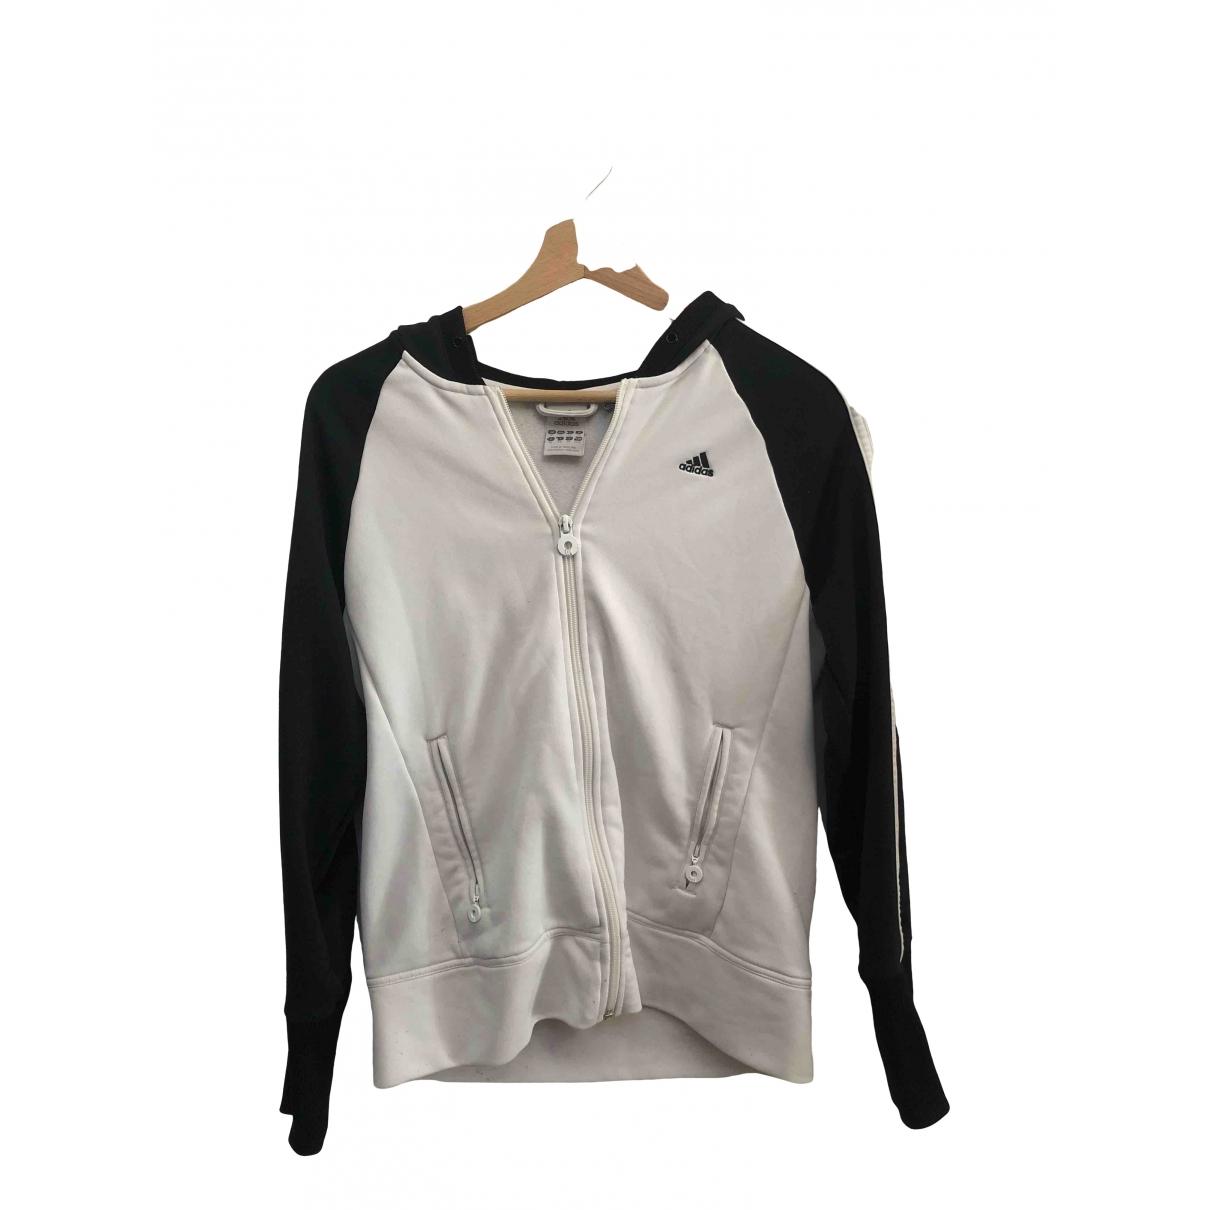 Adidas \N White Knitwear for Kids 14 years - S UK